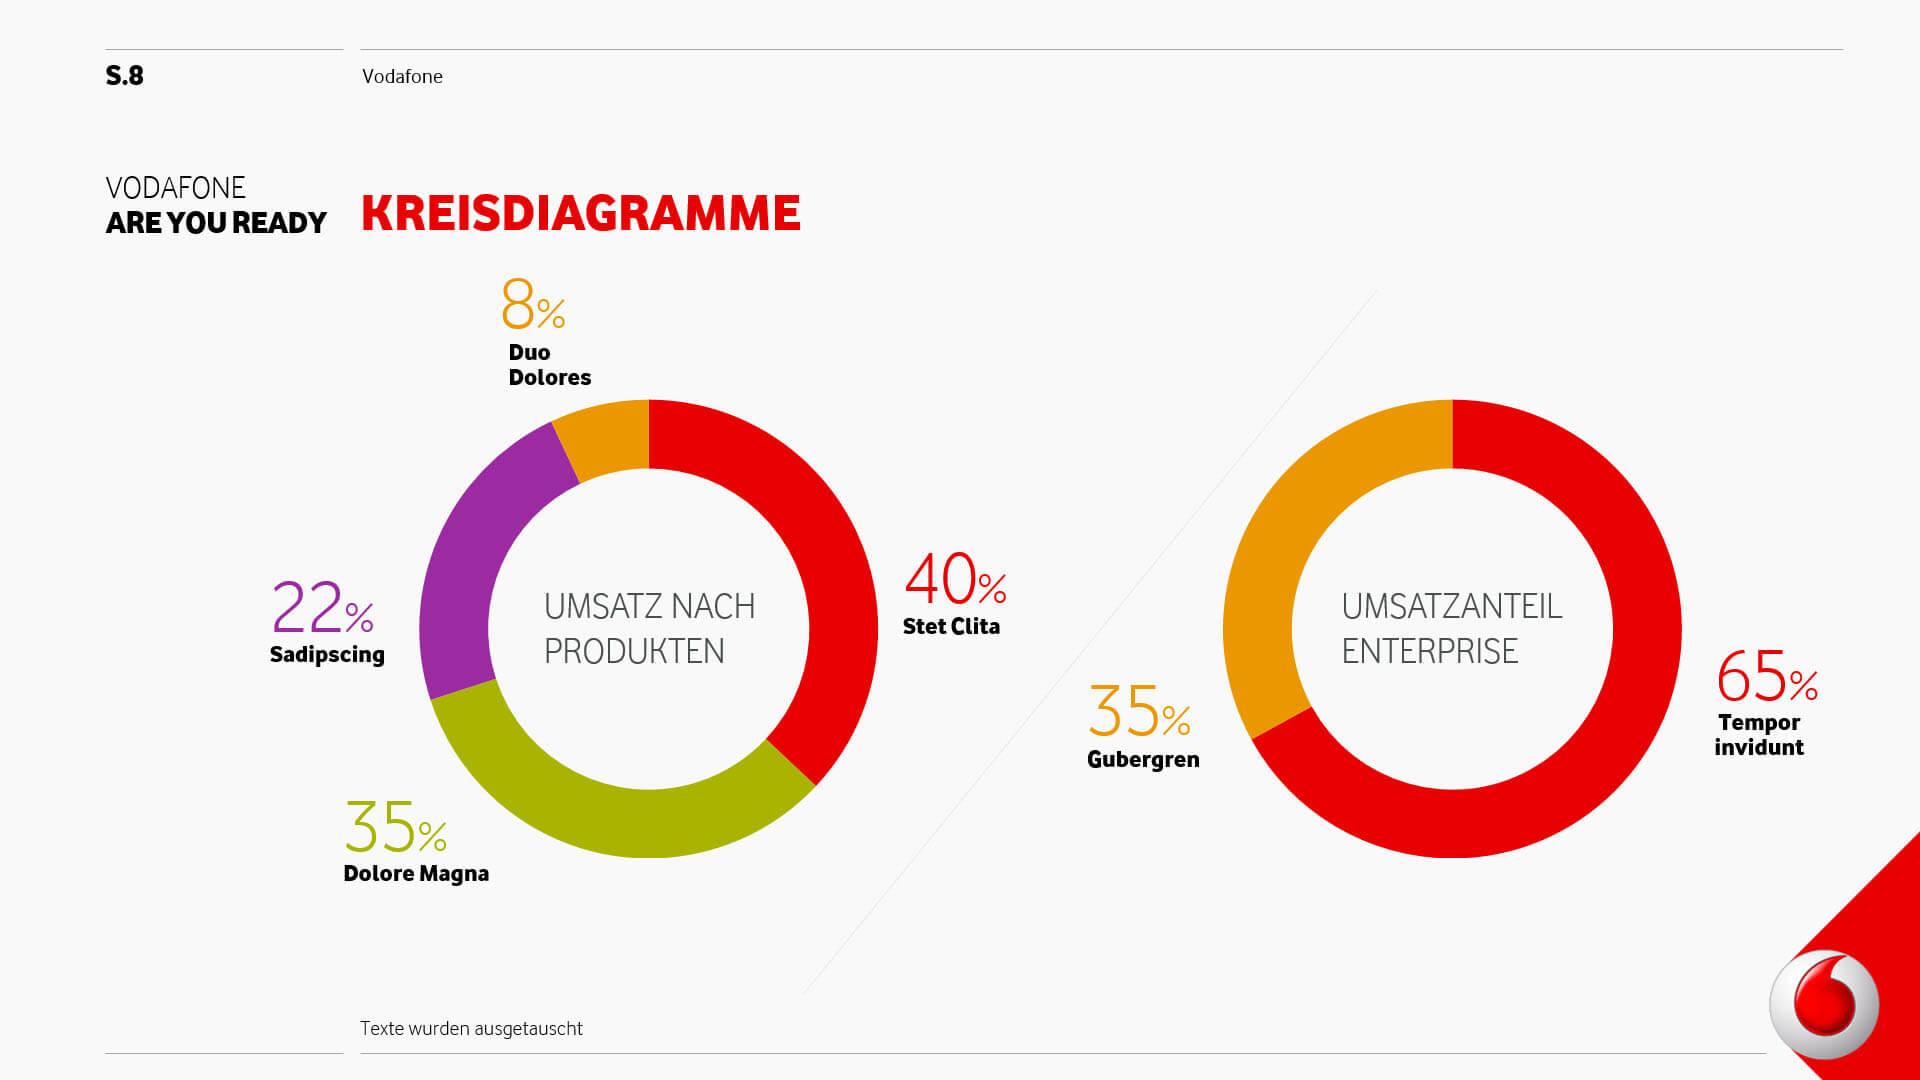 powerpoint-presentation for vodafone | inscale, Presentation templates